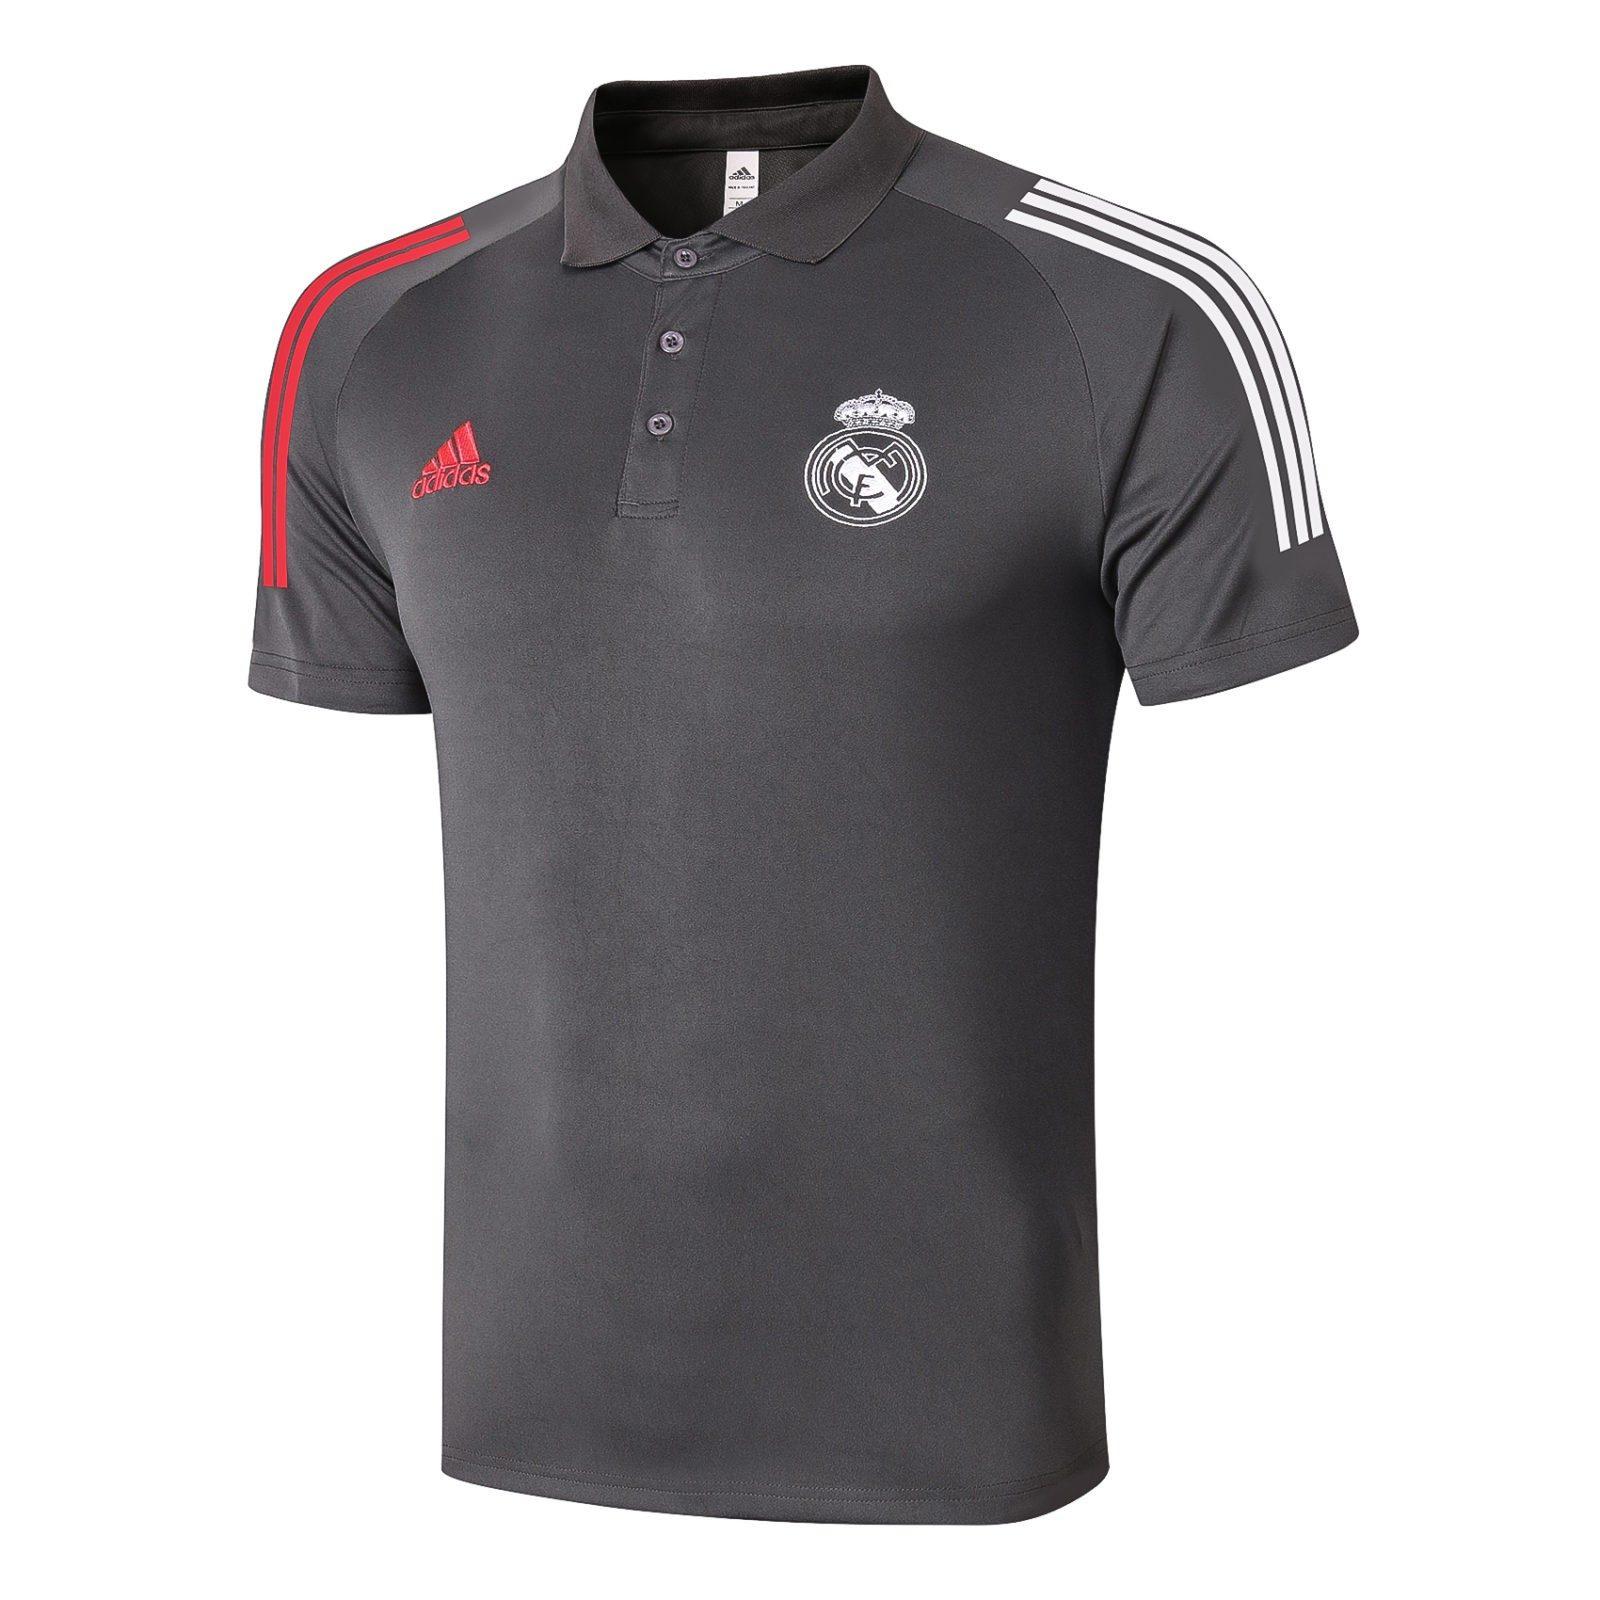 Футболка поло Реал Мадрид сезон 2020-2021 (Чёрная)